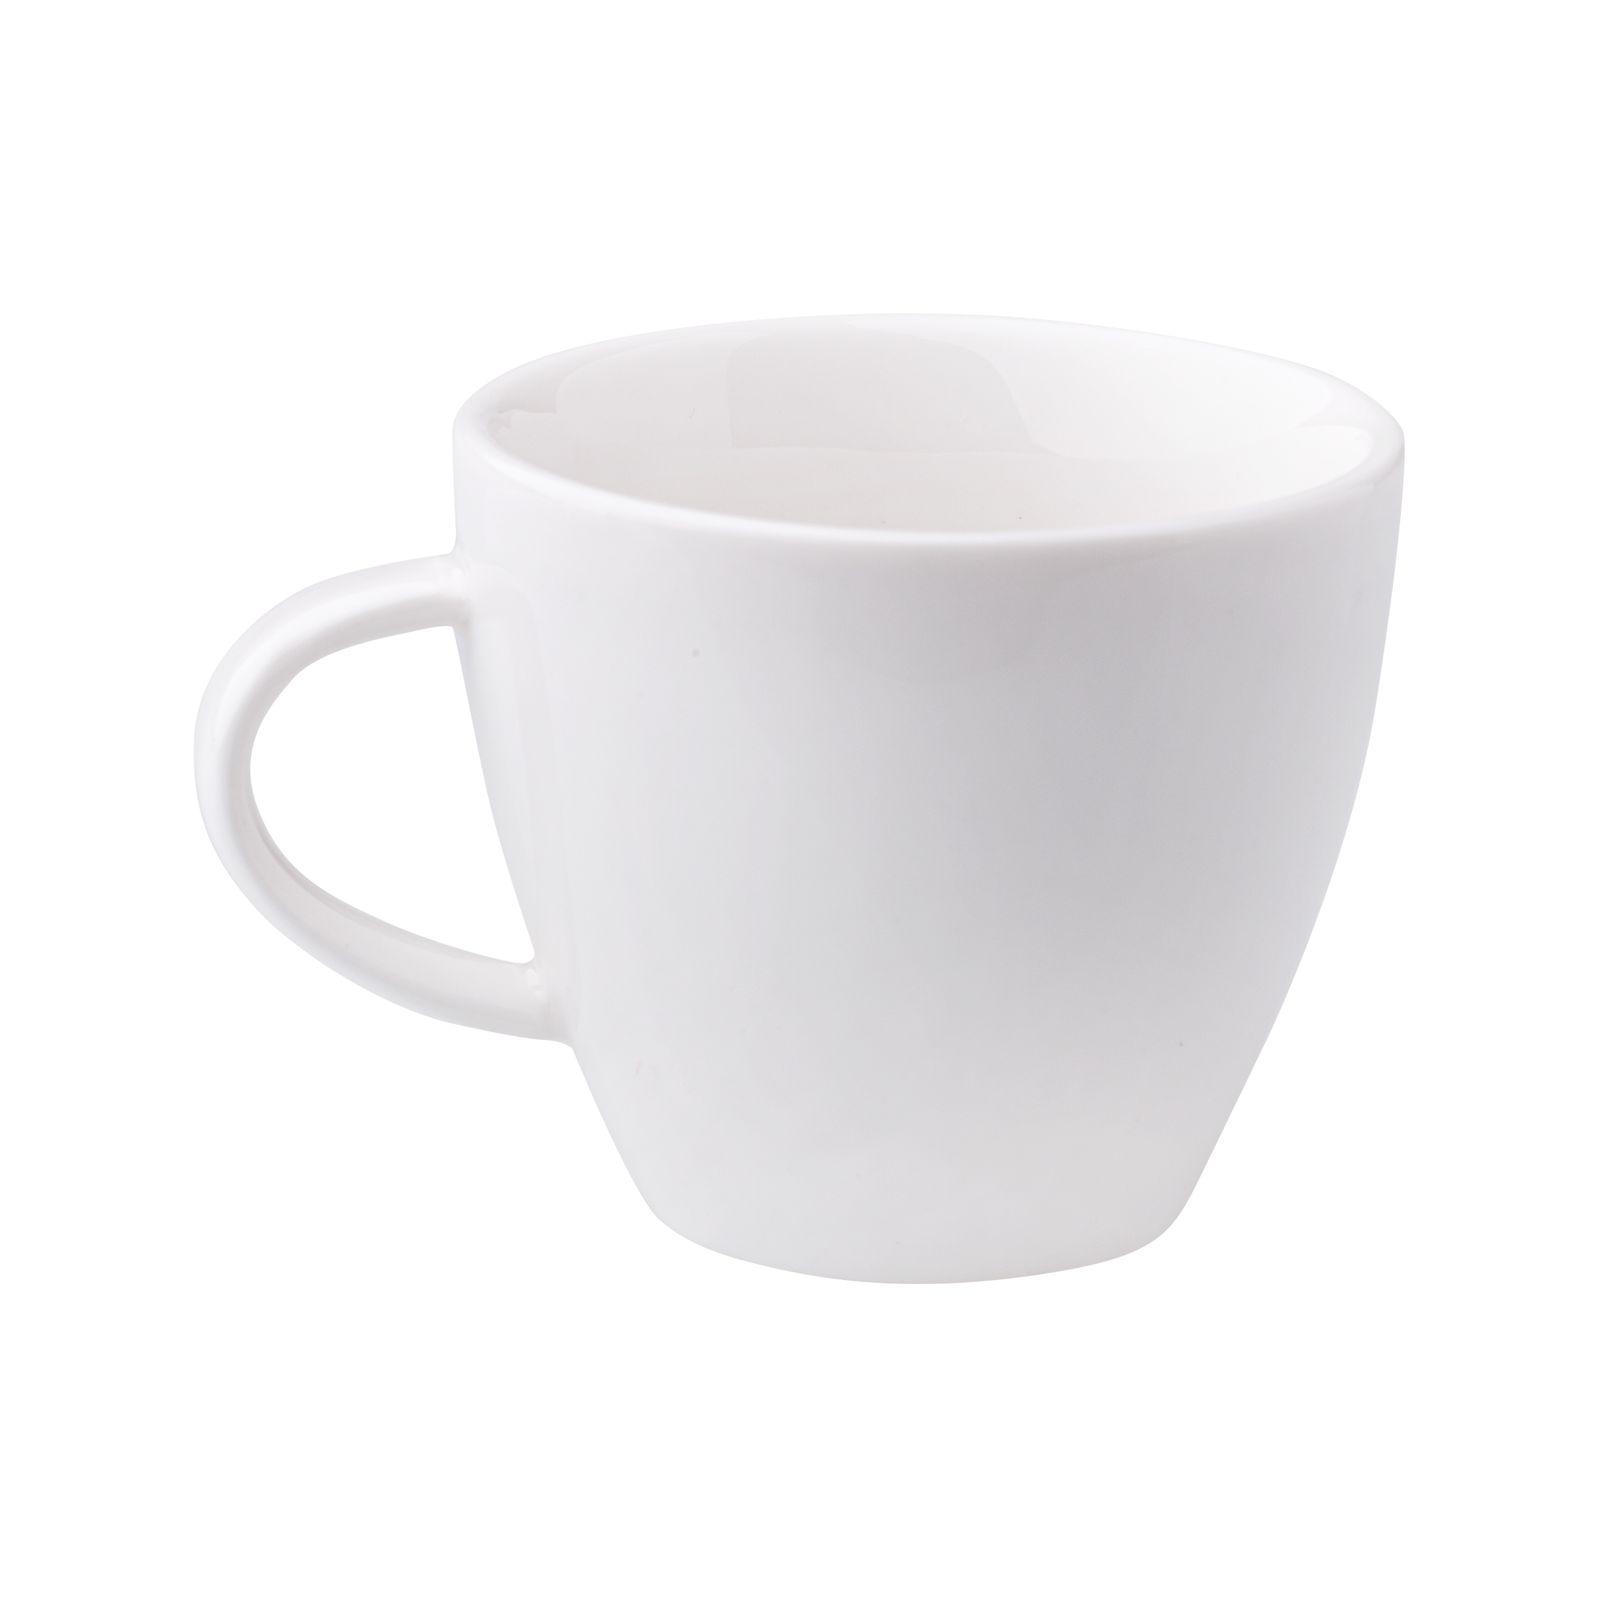 Filiżanka do espresso Kubiko / Fala 80 ml AMBITION